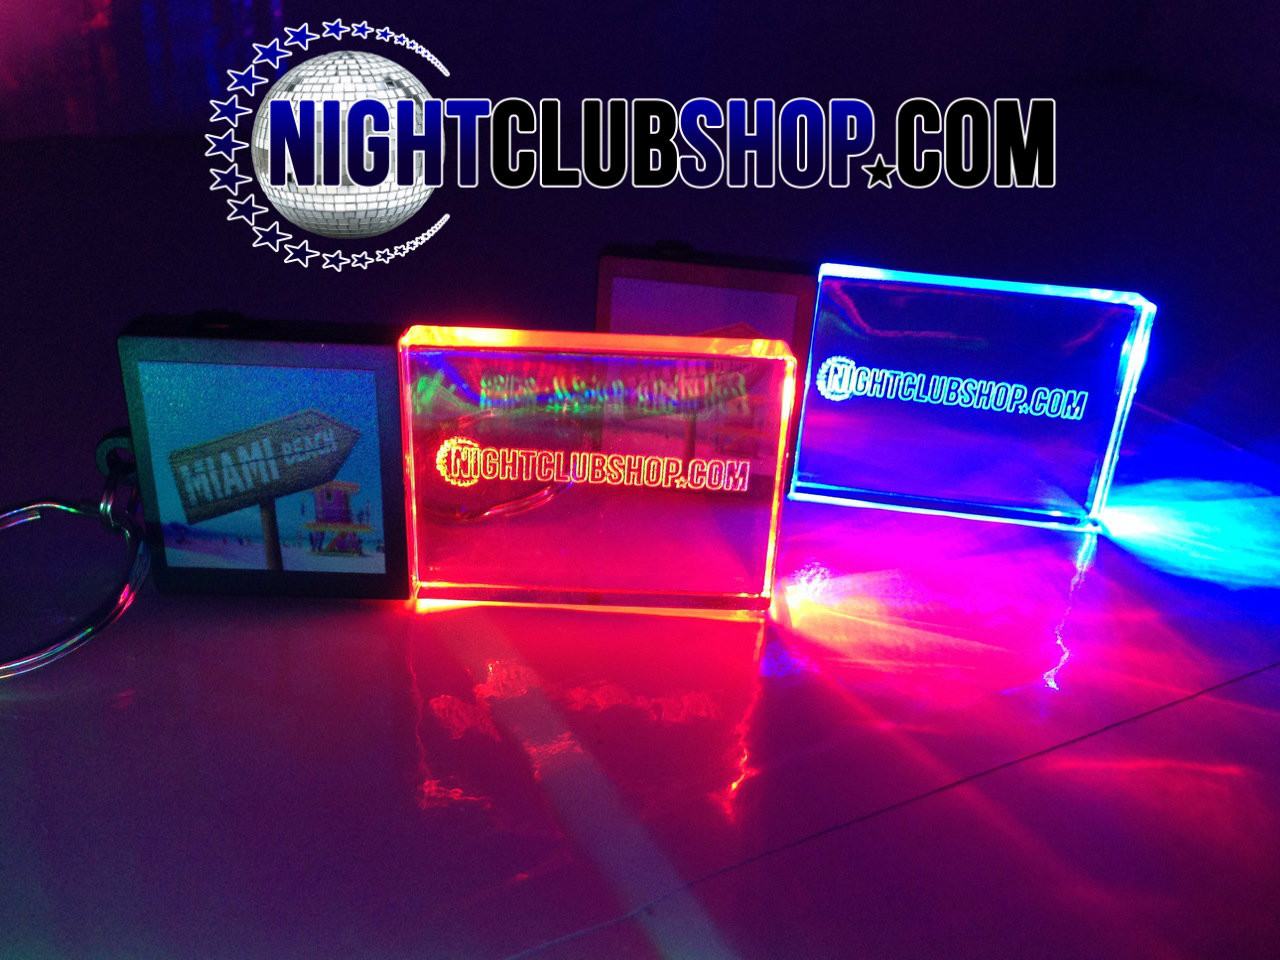 LED,Keychain,Key,chain,LED keychain, custom, BEAM, dual, print,engraved, logo,text, laser engraved,personalized,promo,merch,fundraiser,nightclub,fund raiser